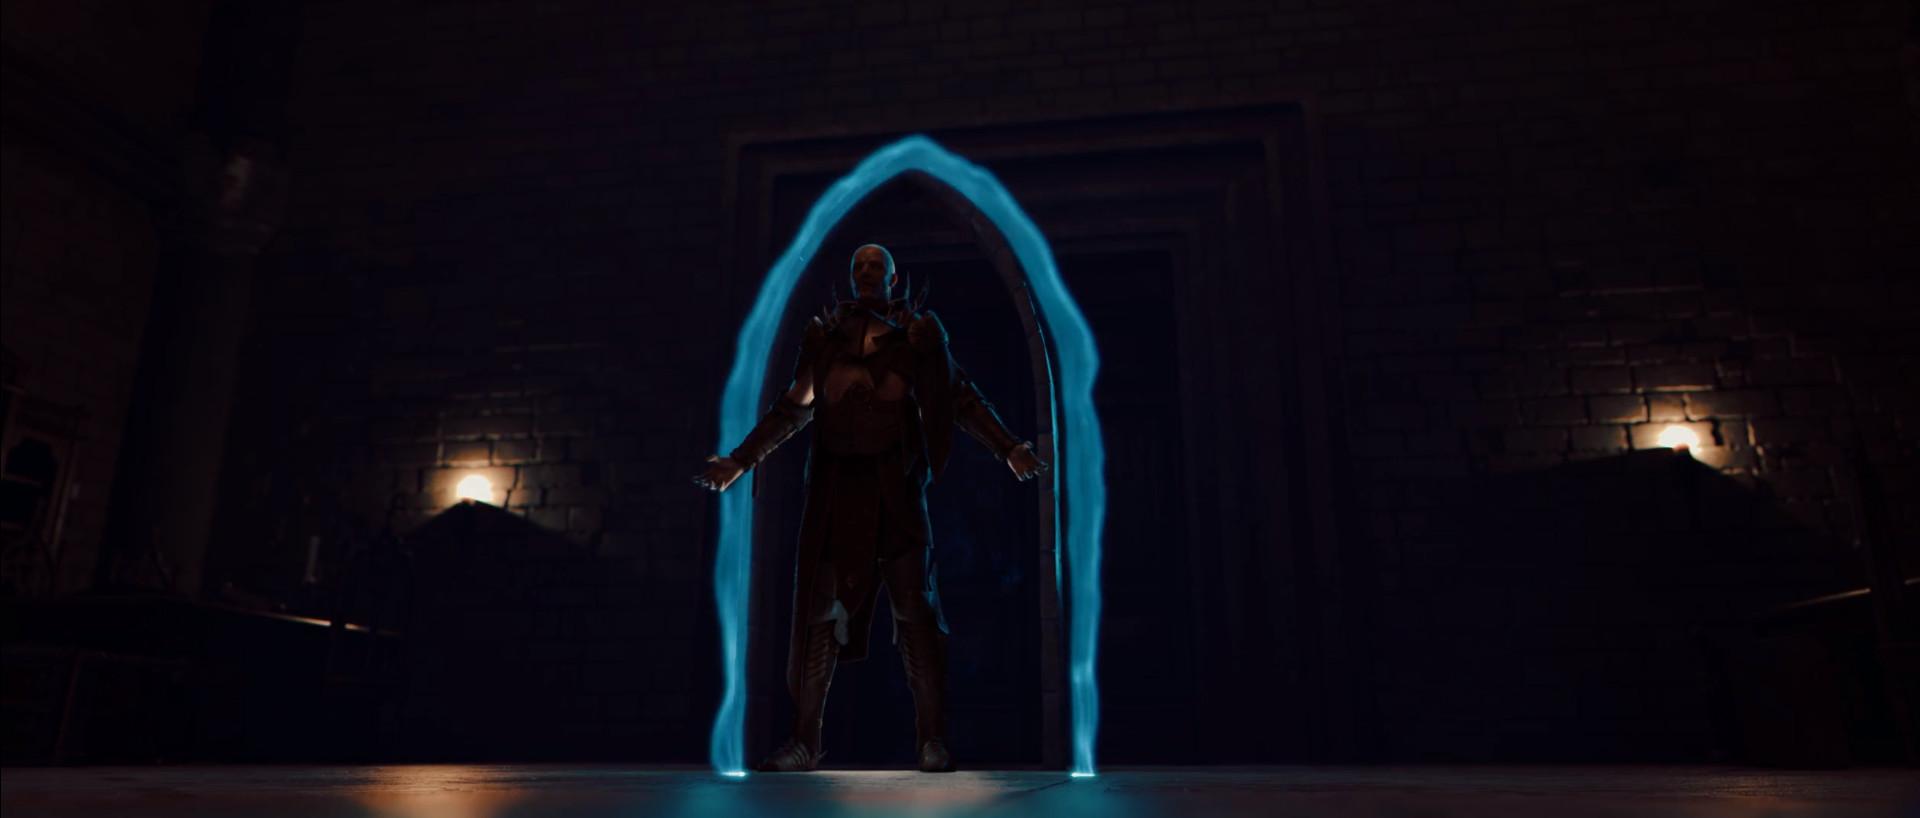 Alec hunstx portalbuild